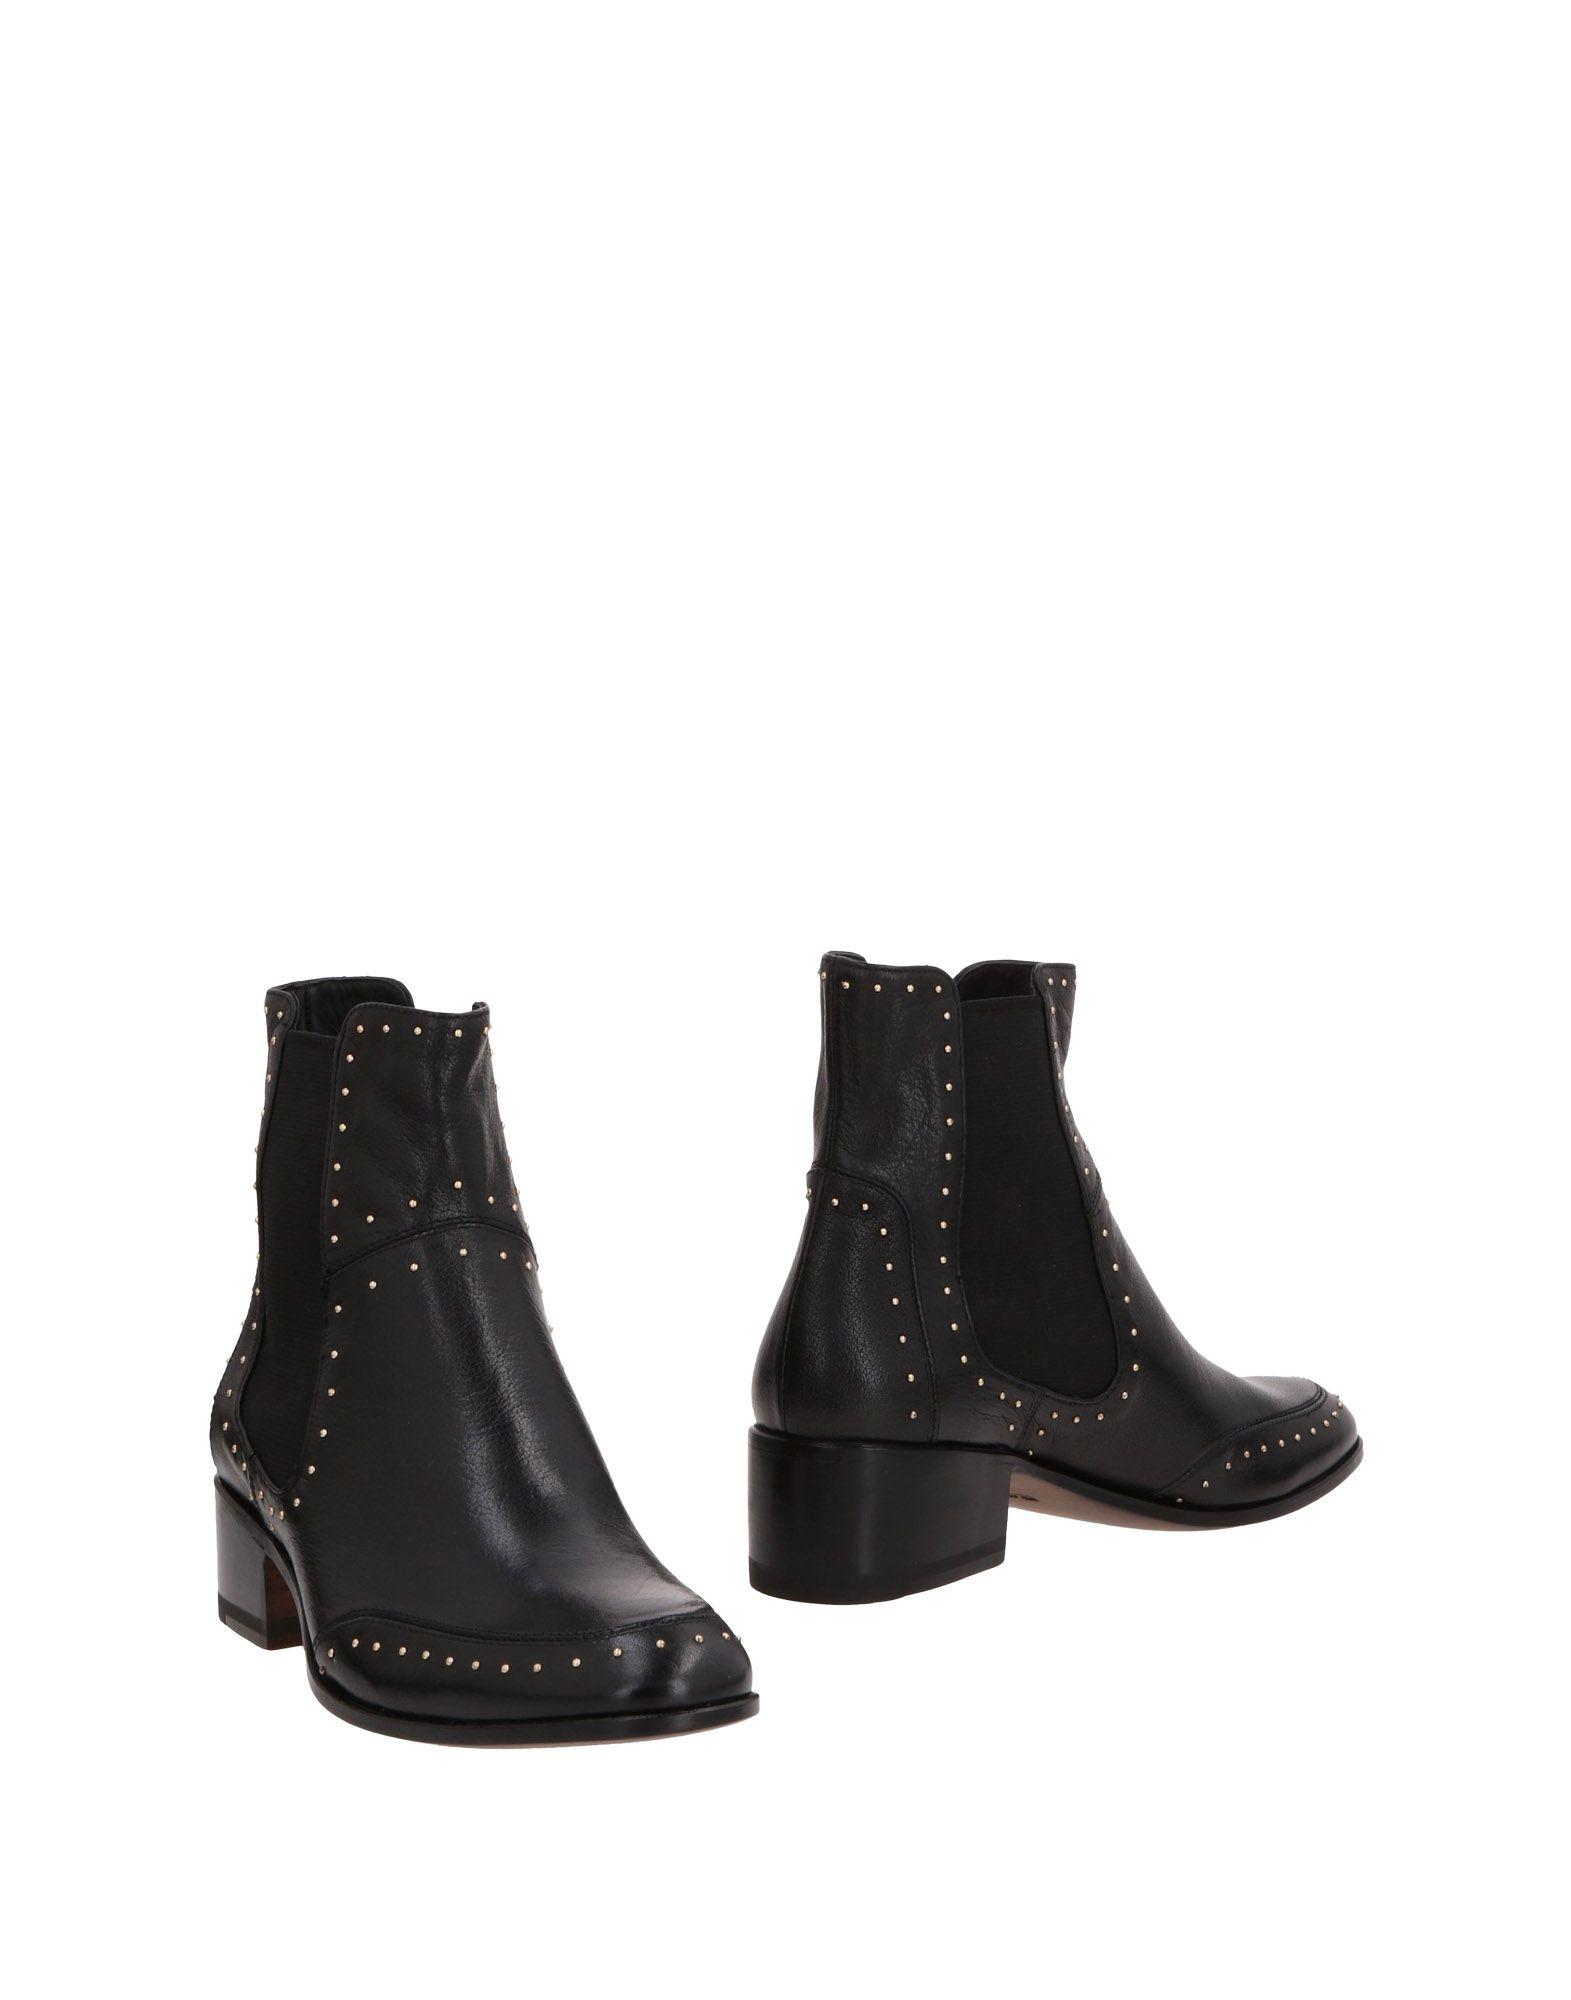 Raparo Stiefelette Damen  11475386FNGut Schuhe aussehende strapazierfähige Schuhe 11475386FNGut c17323